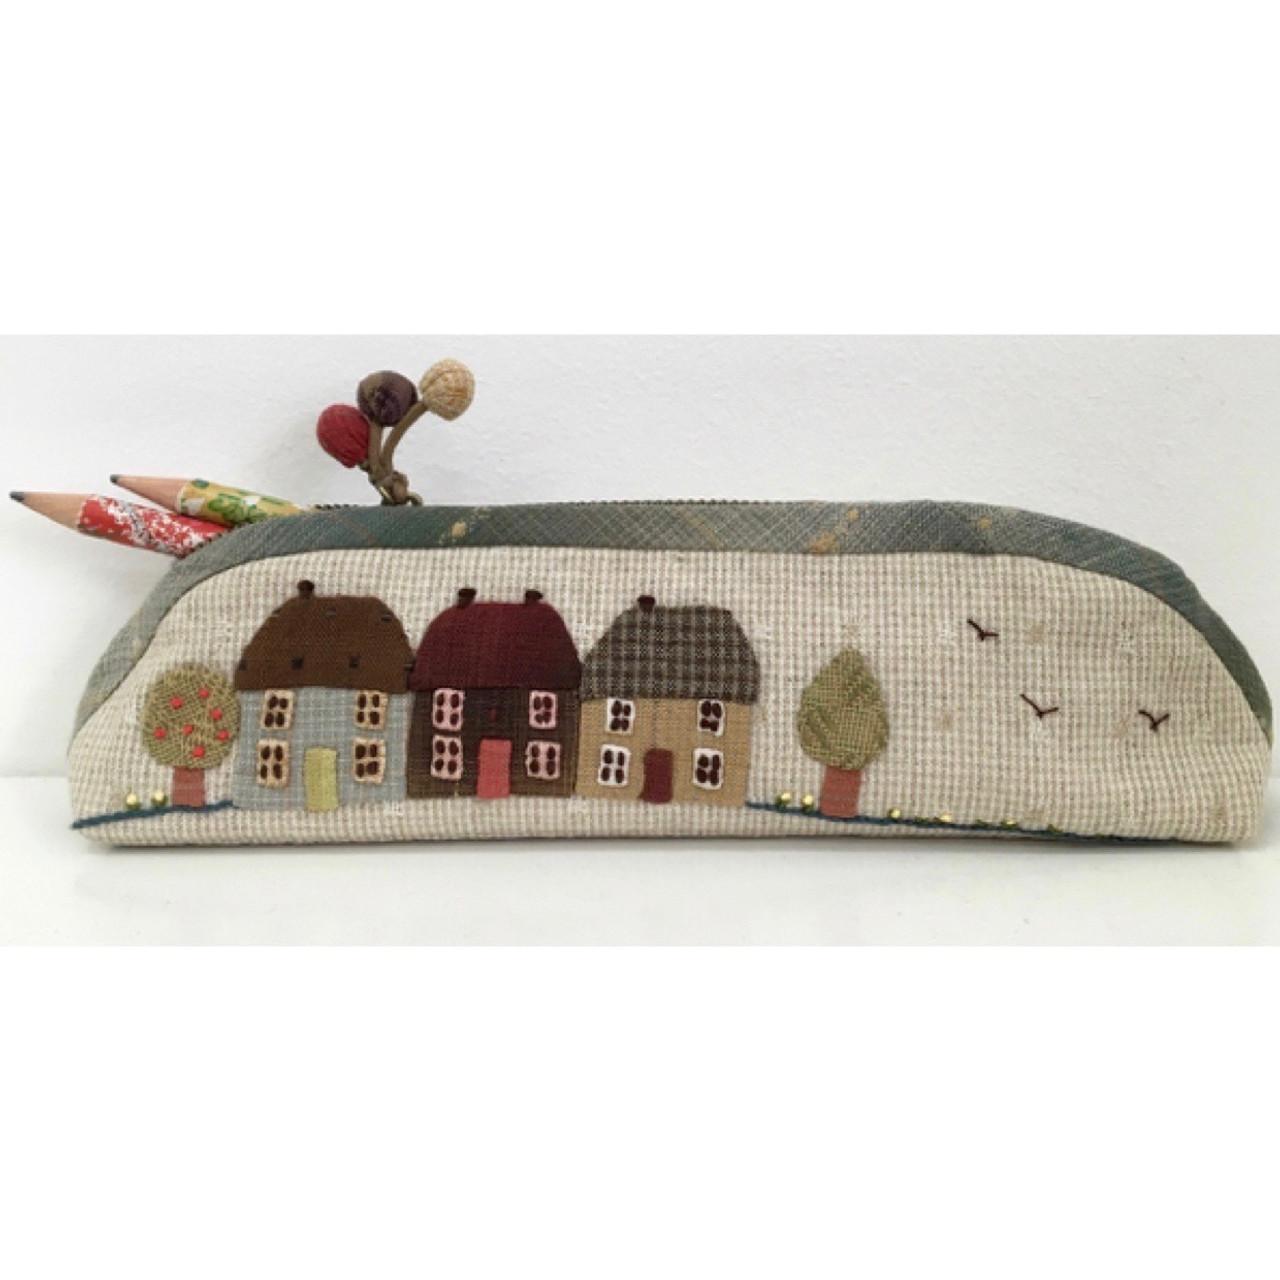 Mathildes Cottages Pencil Case Kit Kpc-Mat - Bebe Bold Japanese Textiles  Craft-9175